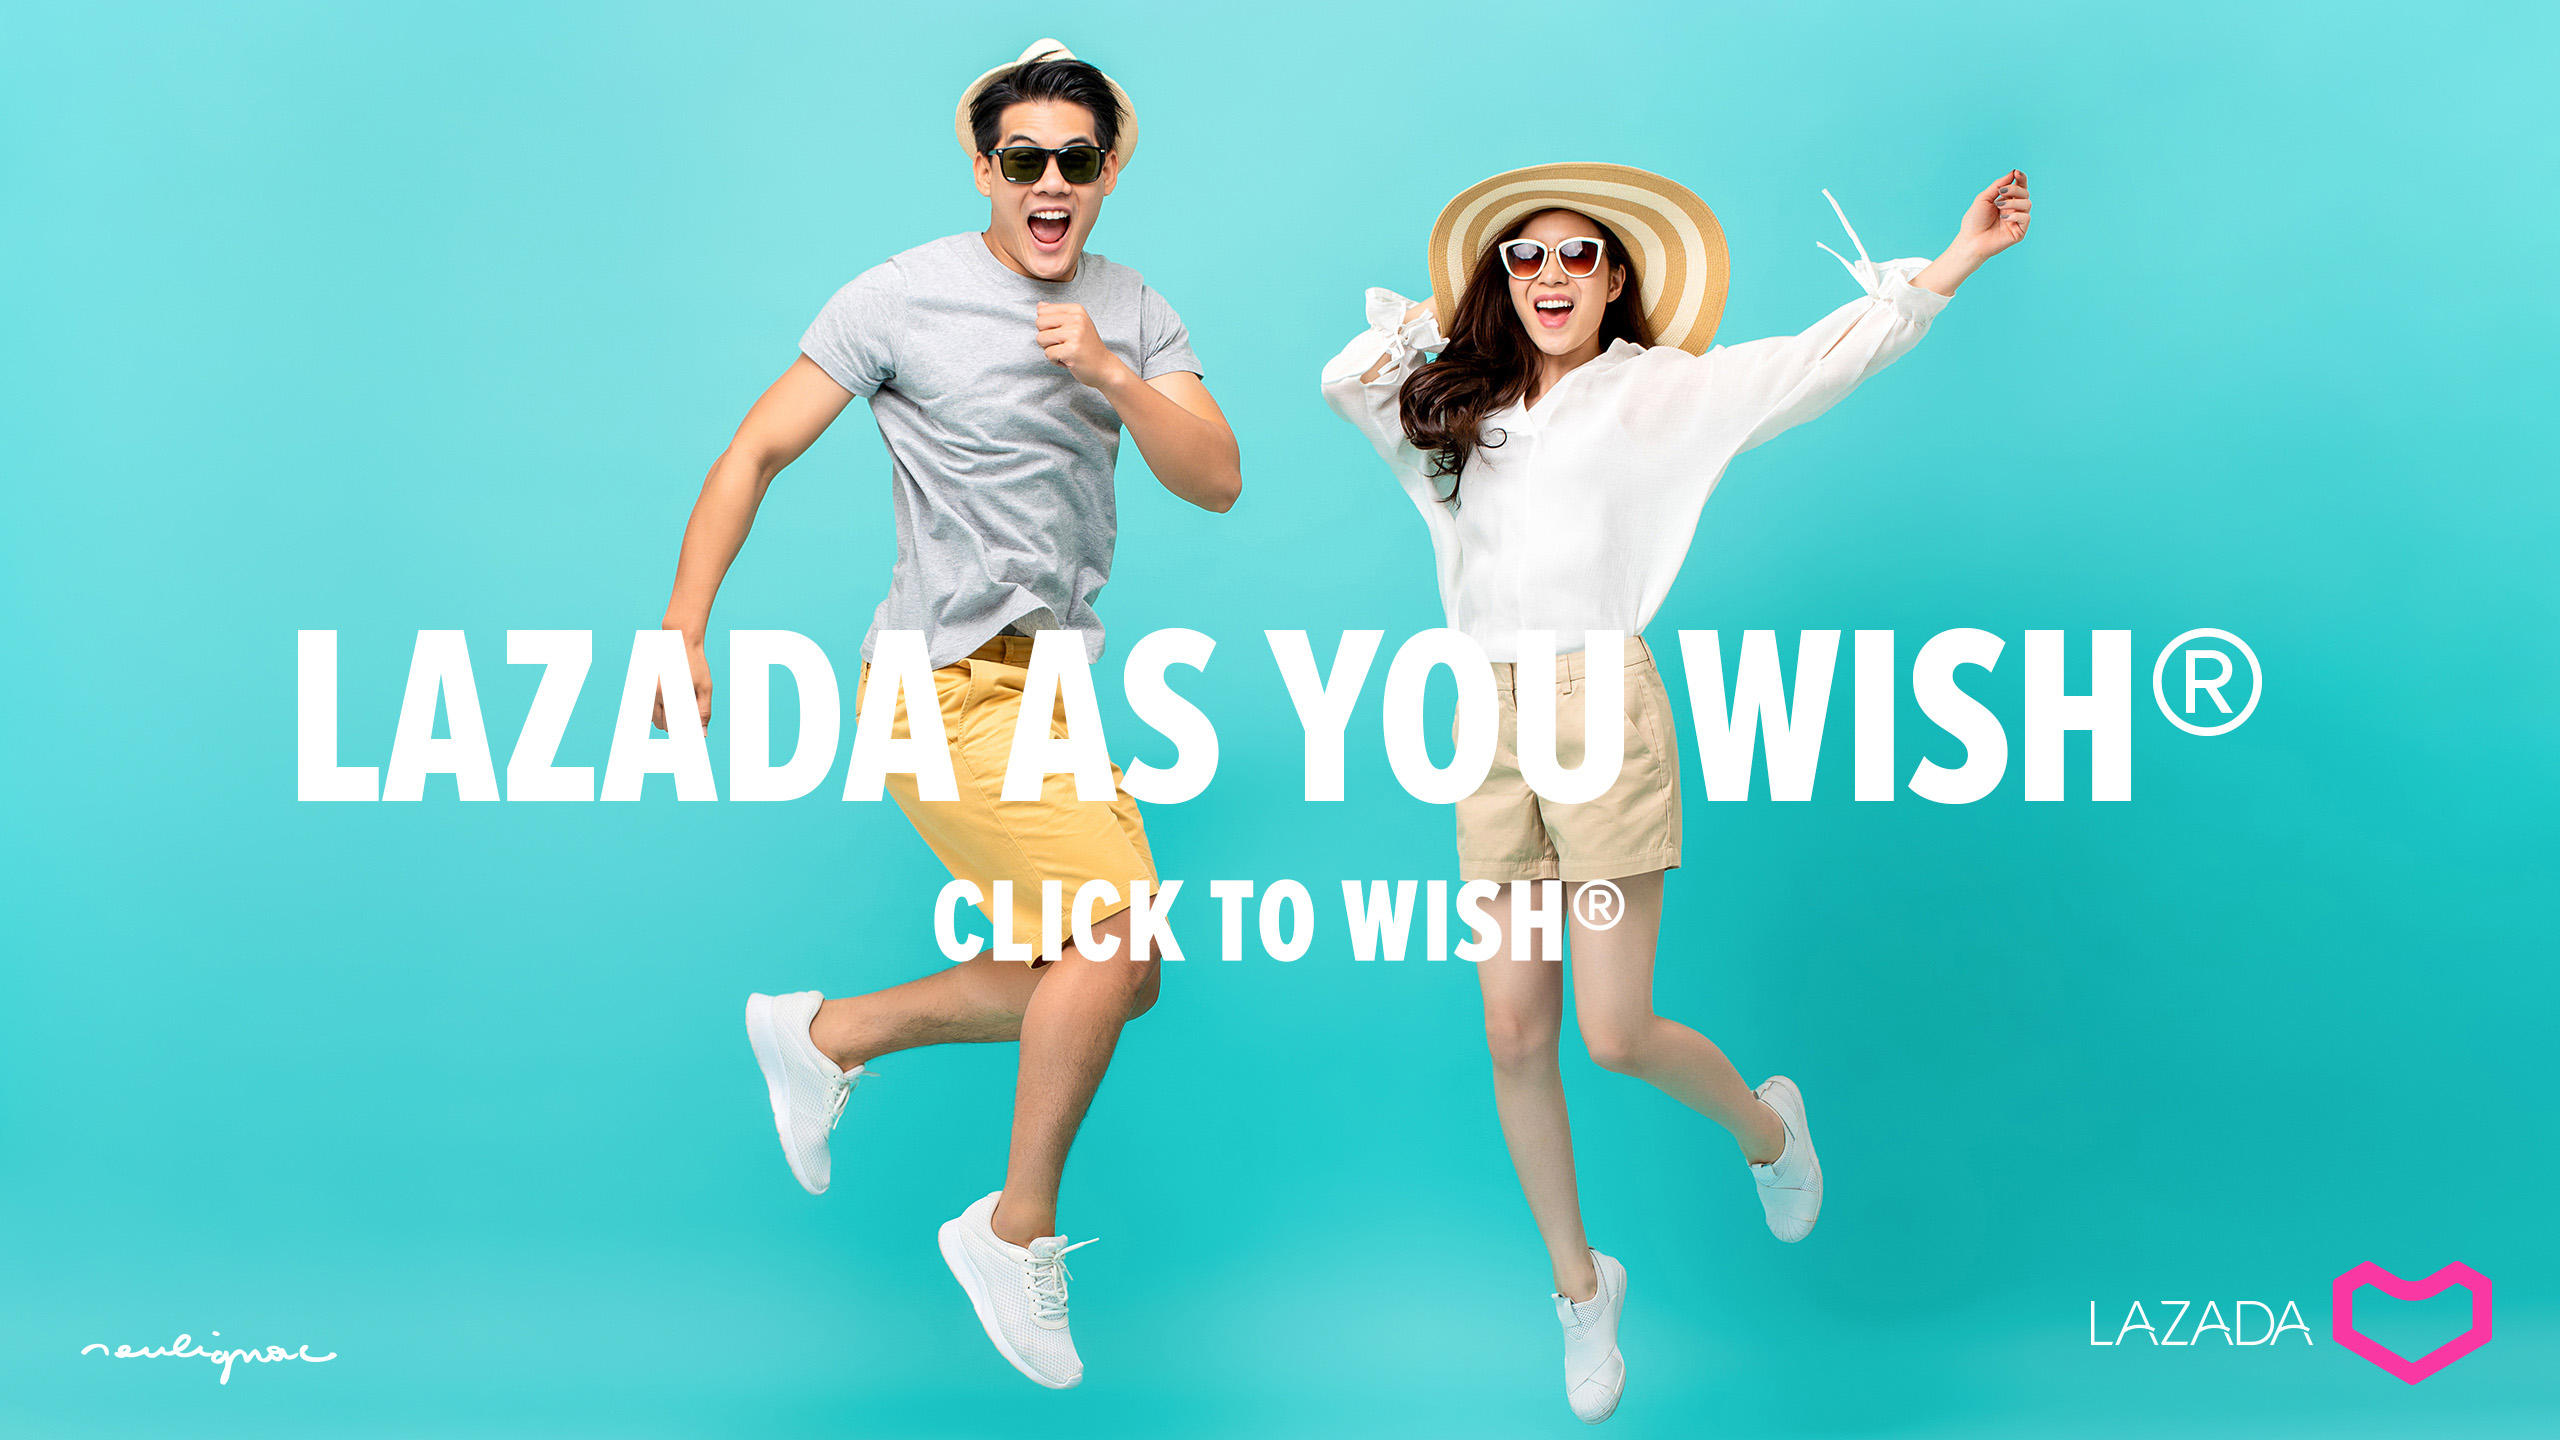 LAZADA Group - Digital Campaign - AS YOU WISH - Francois Soulignac - Digital Creative & Art Director - MADJOR Labbrand Shanghai